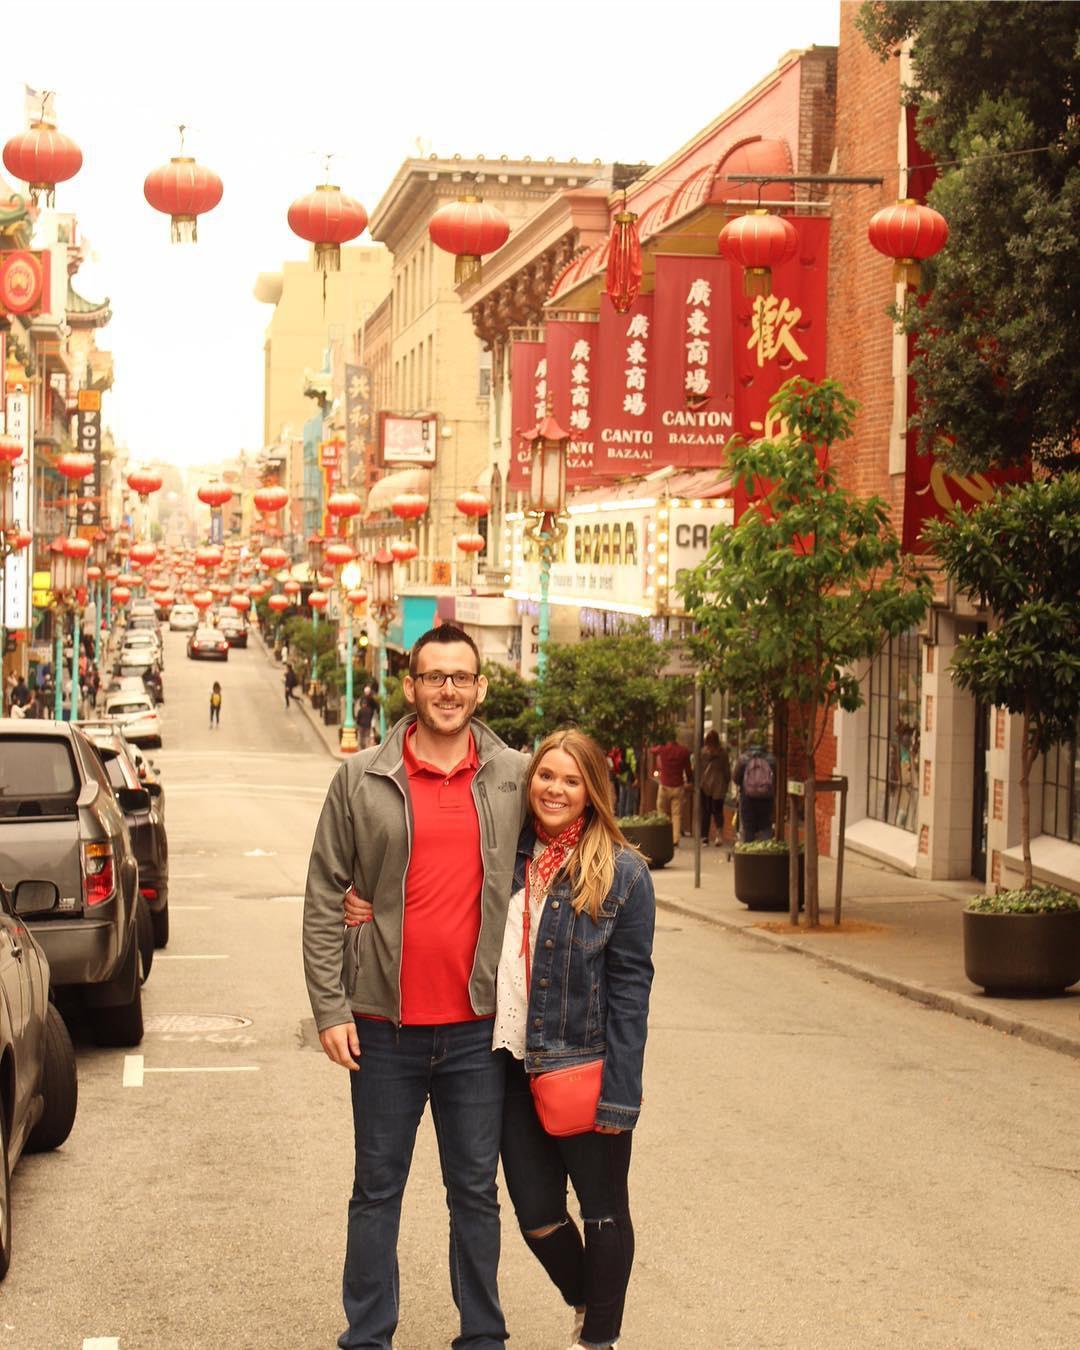 China Town in San Francisco, CA